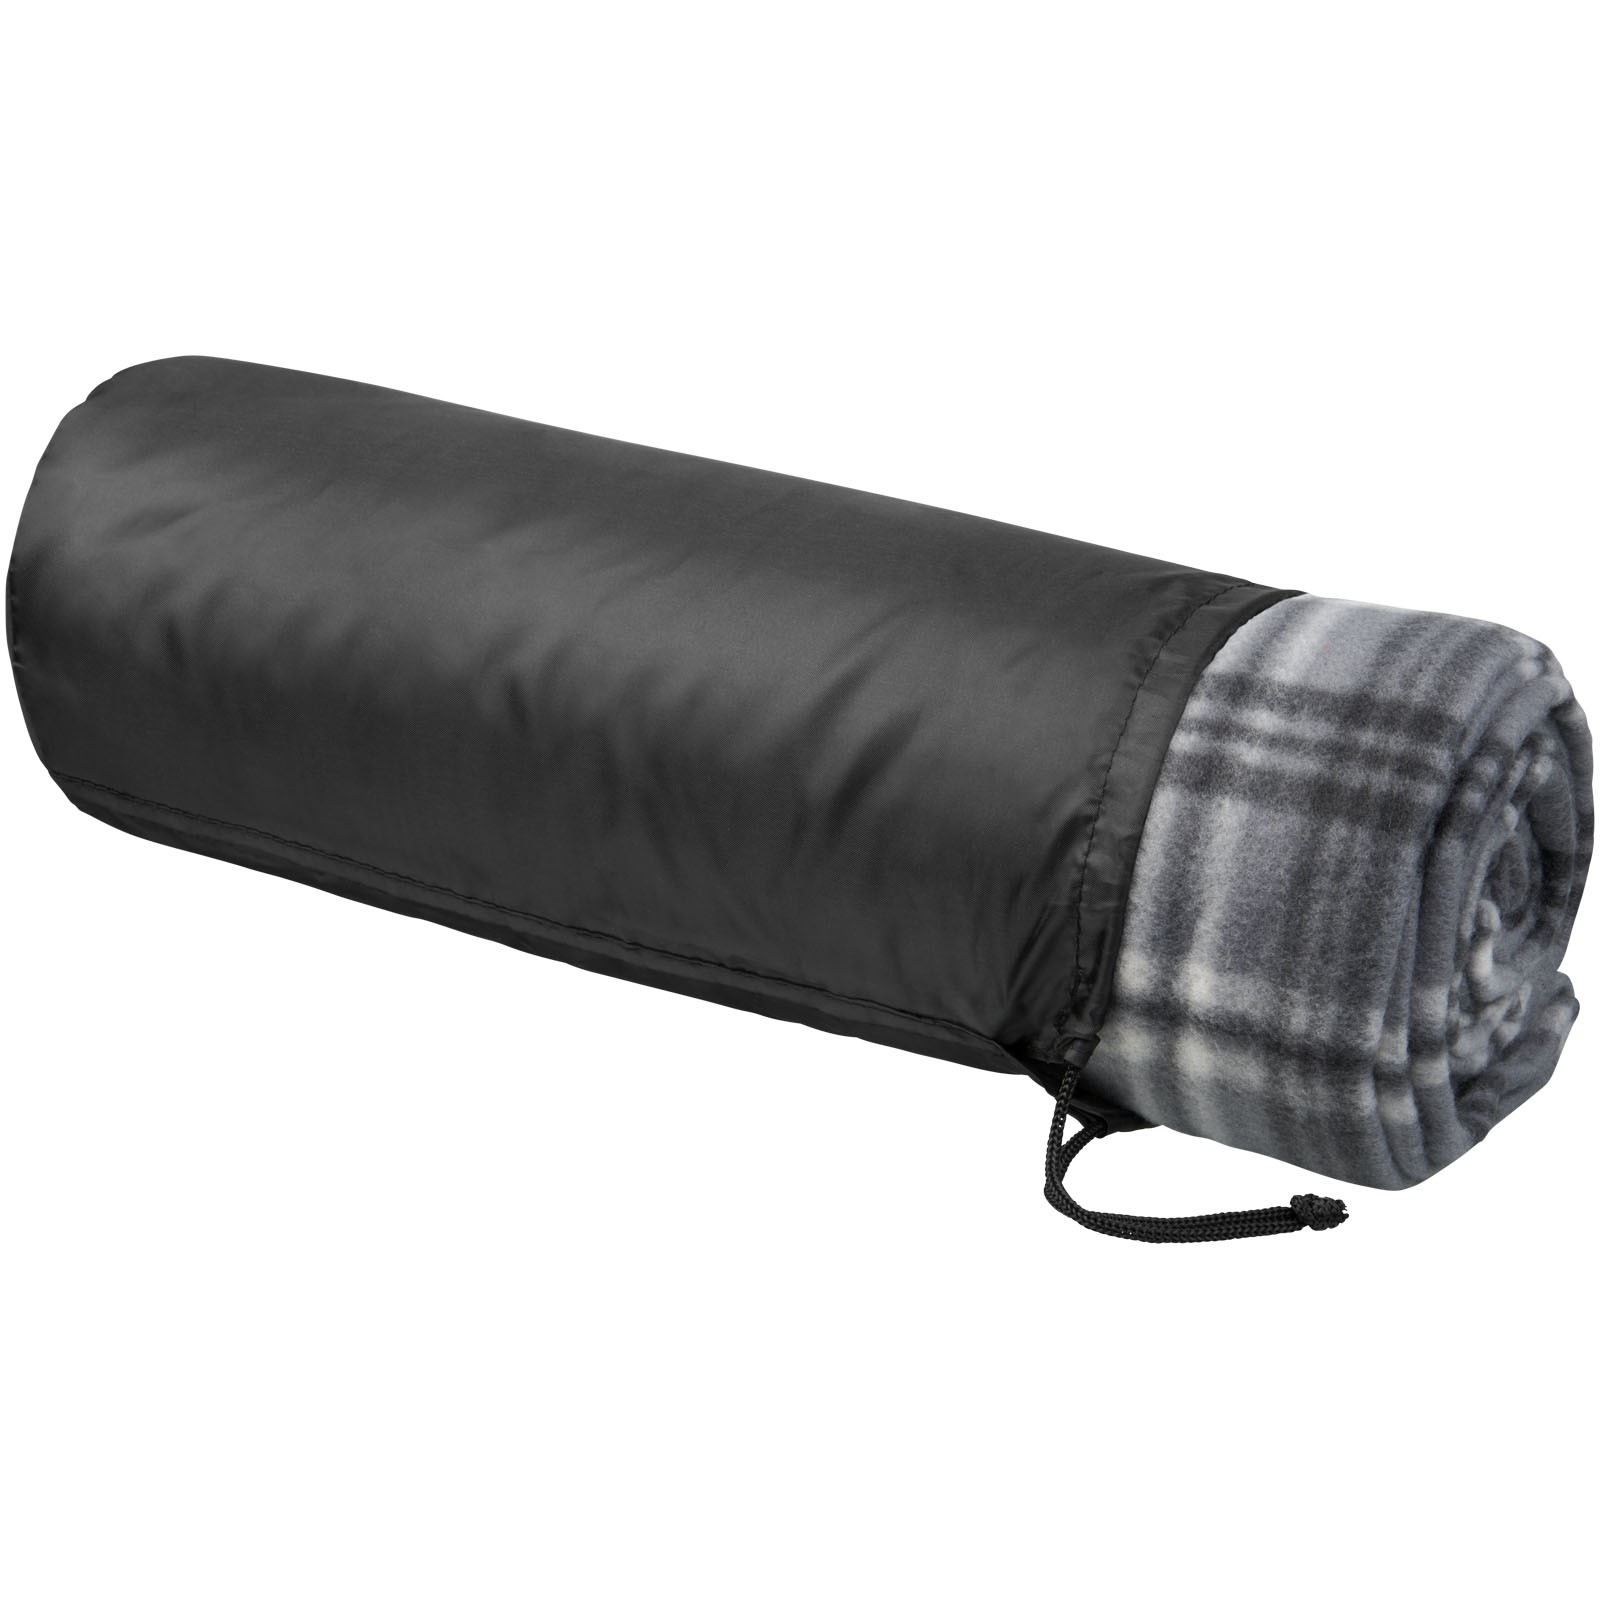 Scot checkered plaid blanket - Solid black